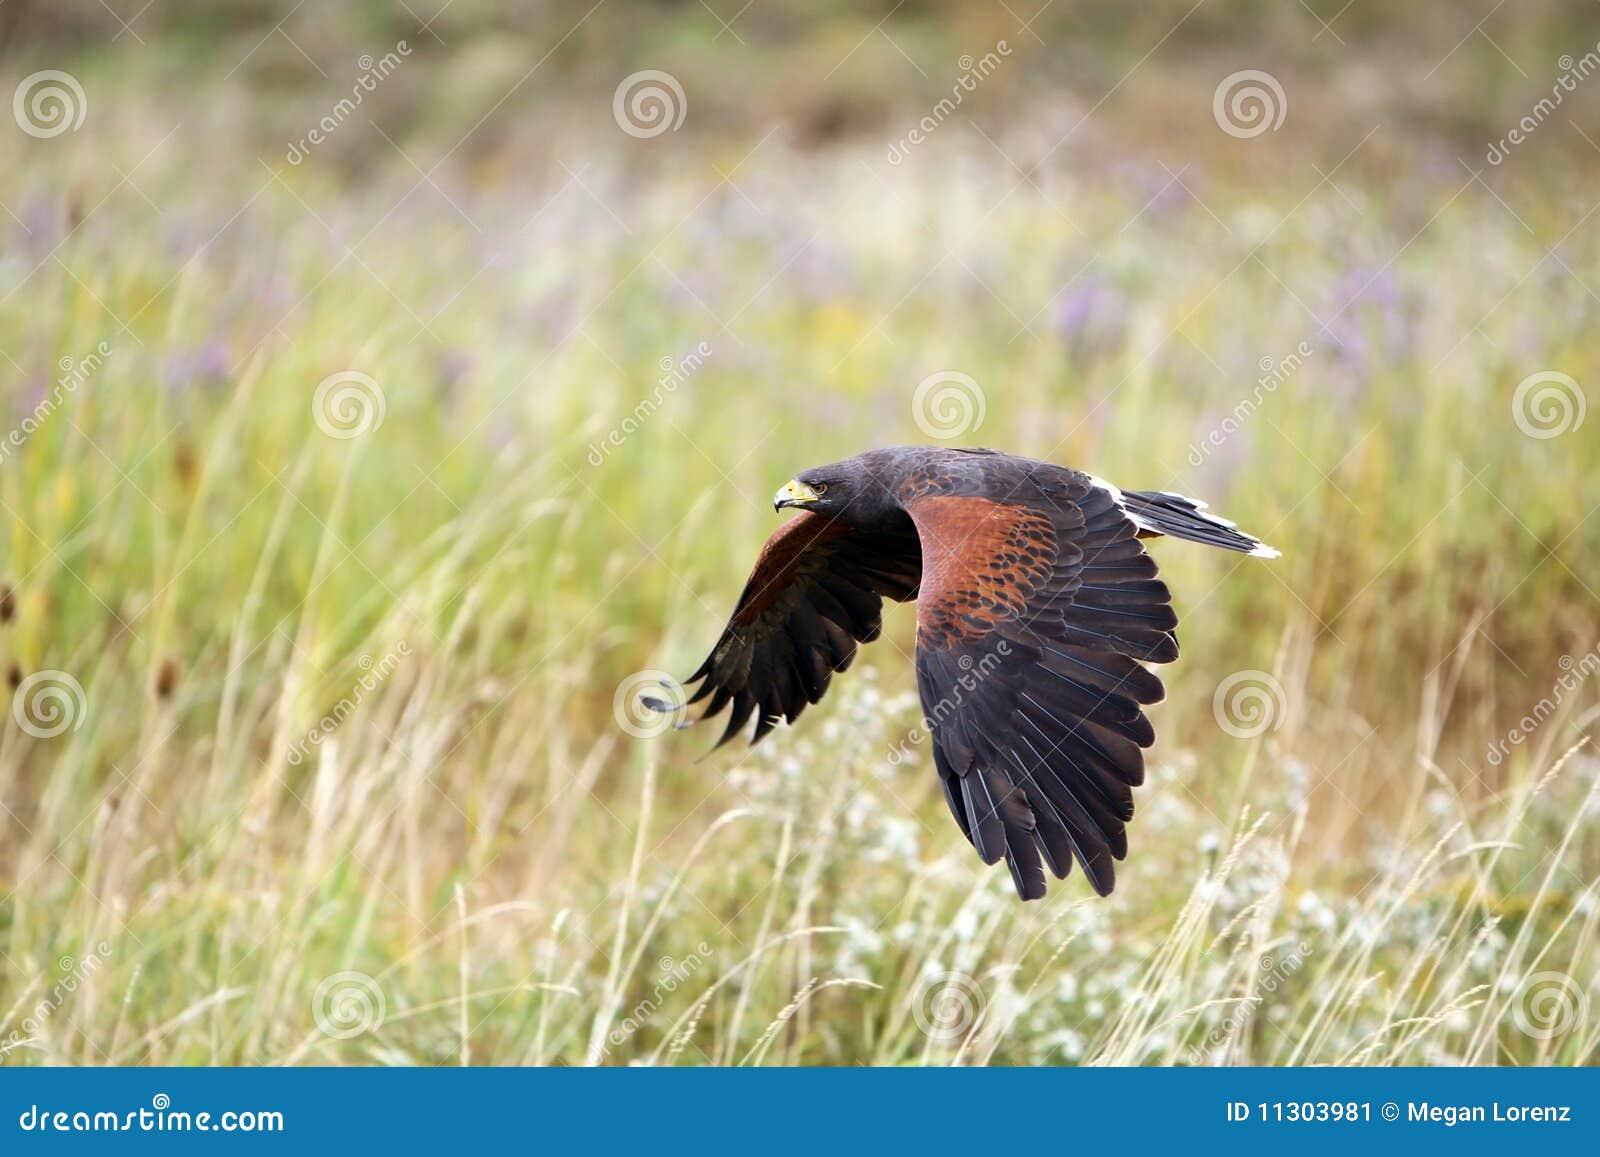 Jagd-Falke